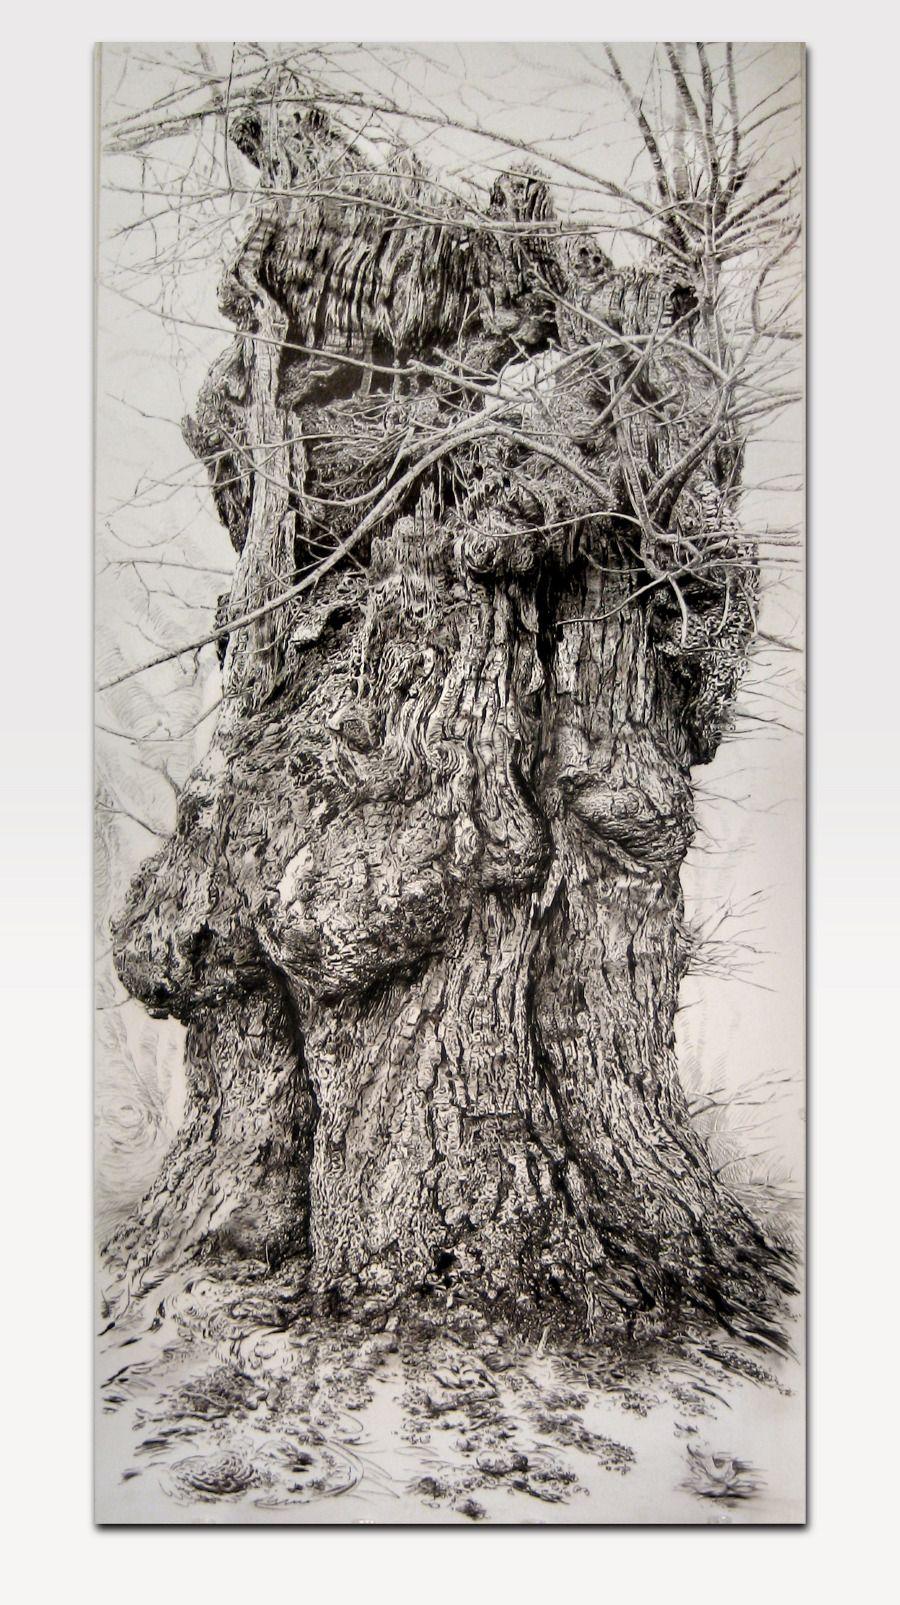 SUGAR MAPLE - Rick Shaefer -charcoal